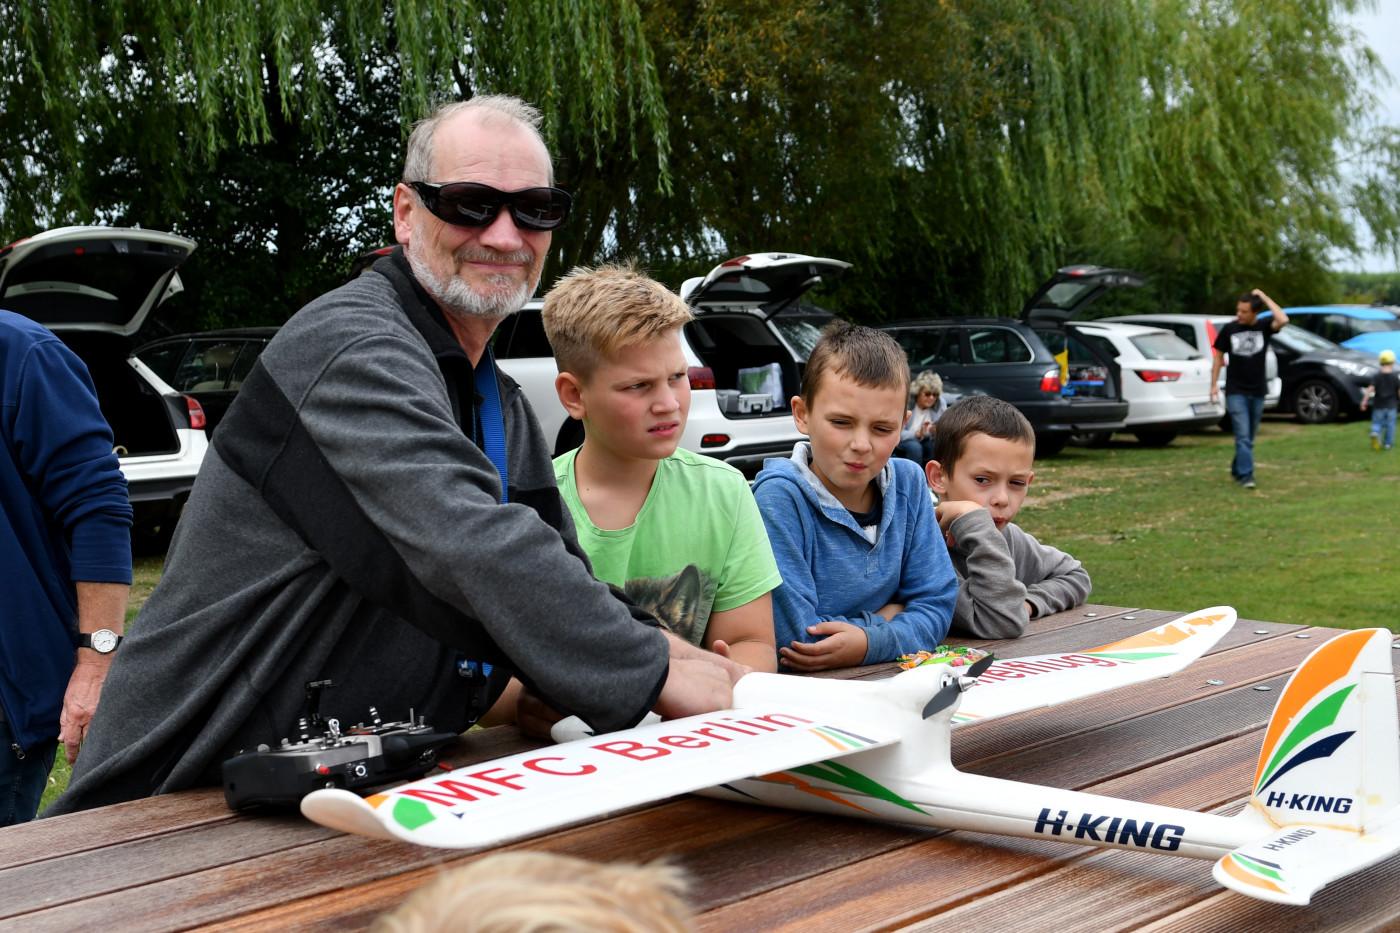 Jugendwart Andreas Jankowski mit Schülern